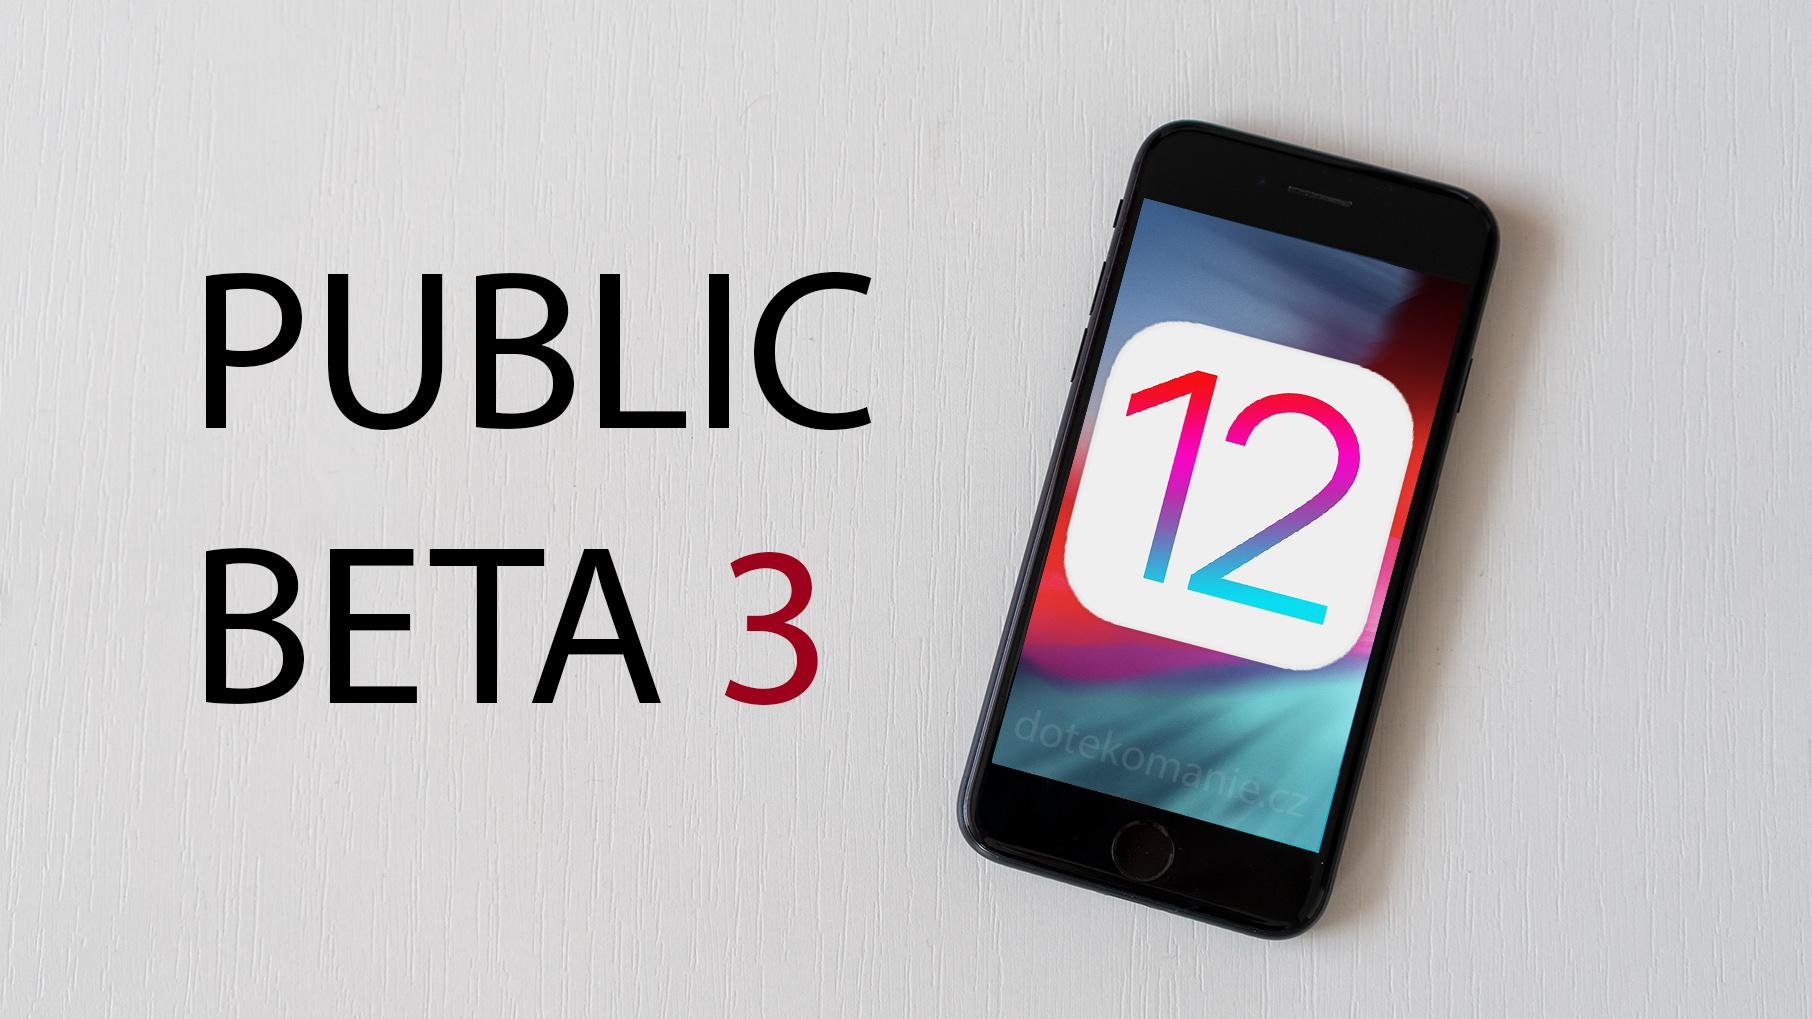 Apple vydal třetí veřejnou betu iOS 12